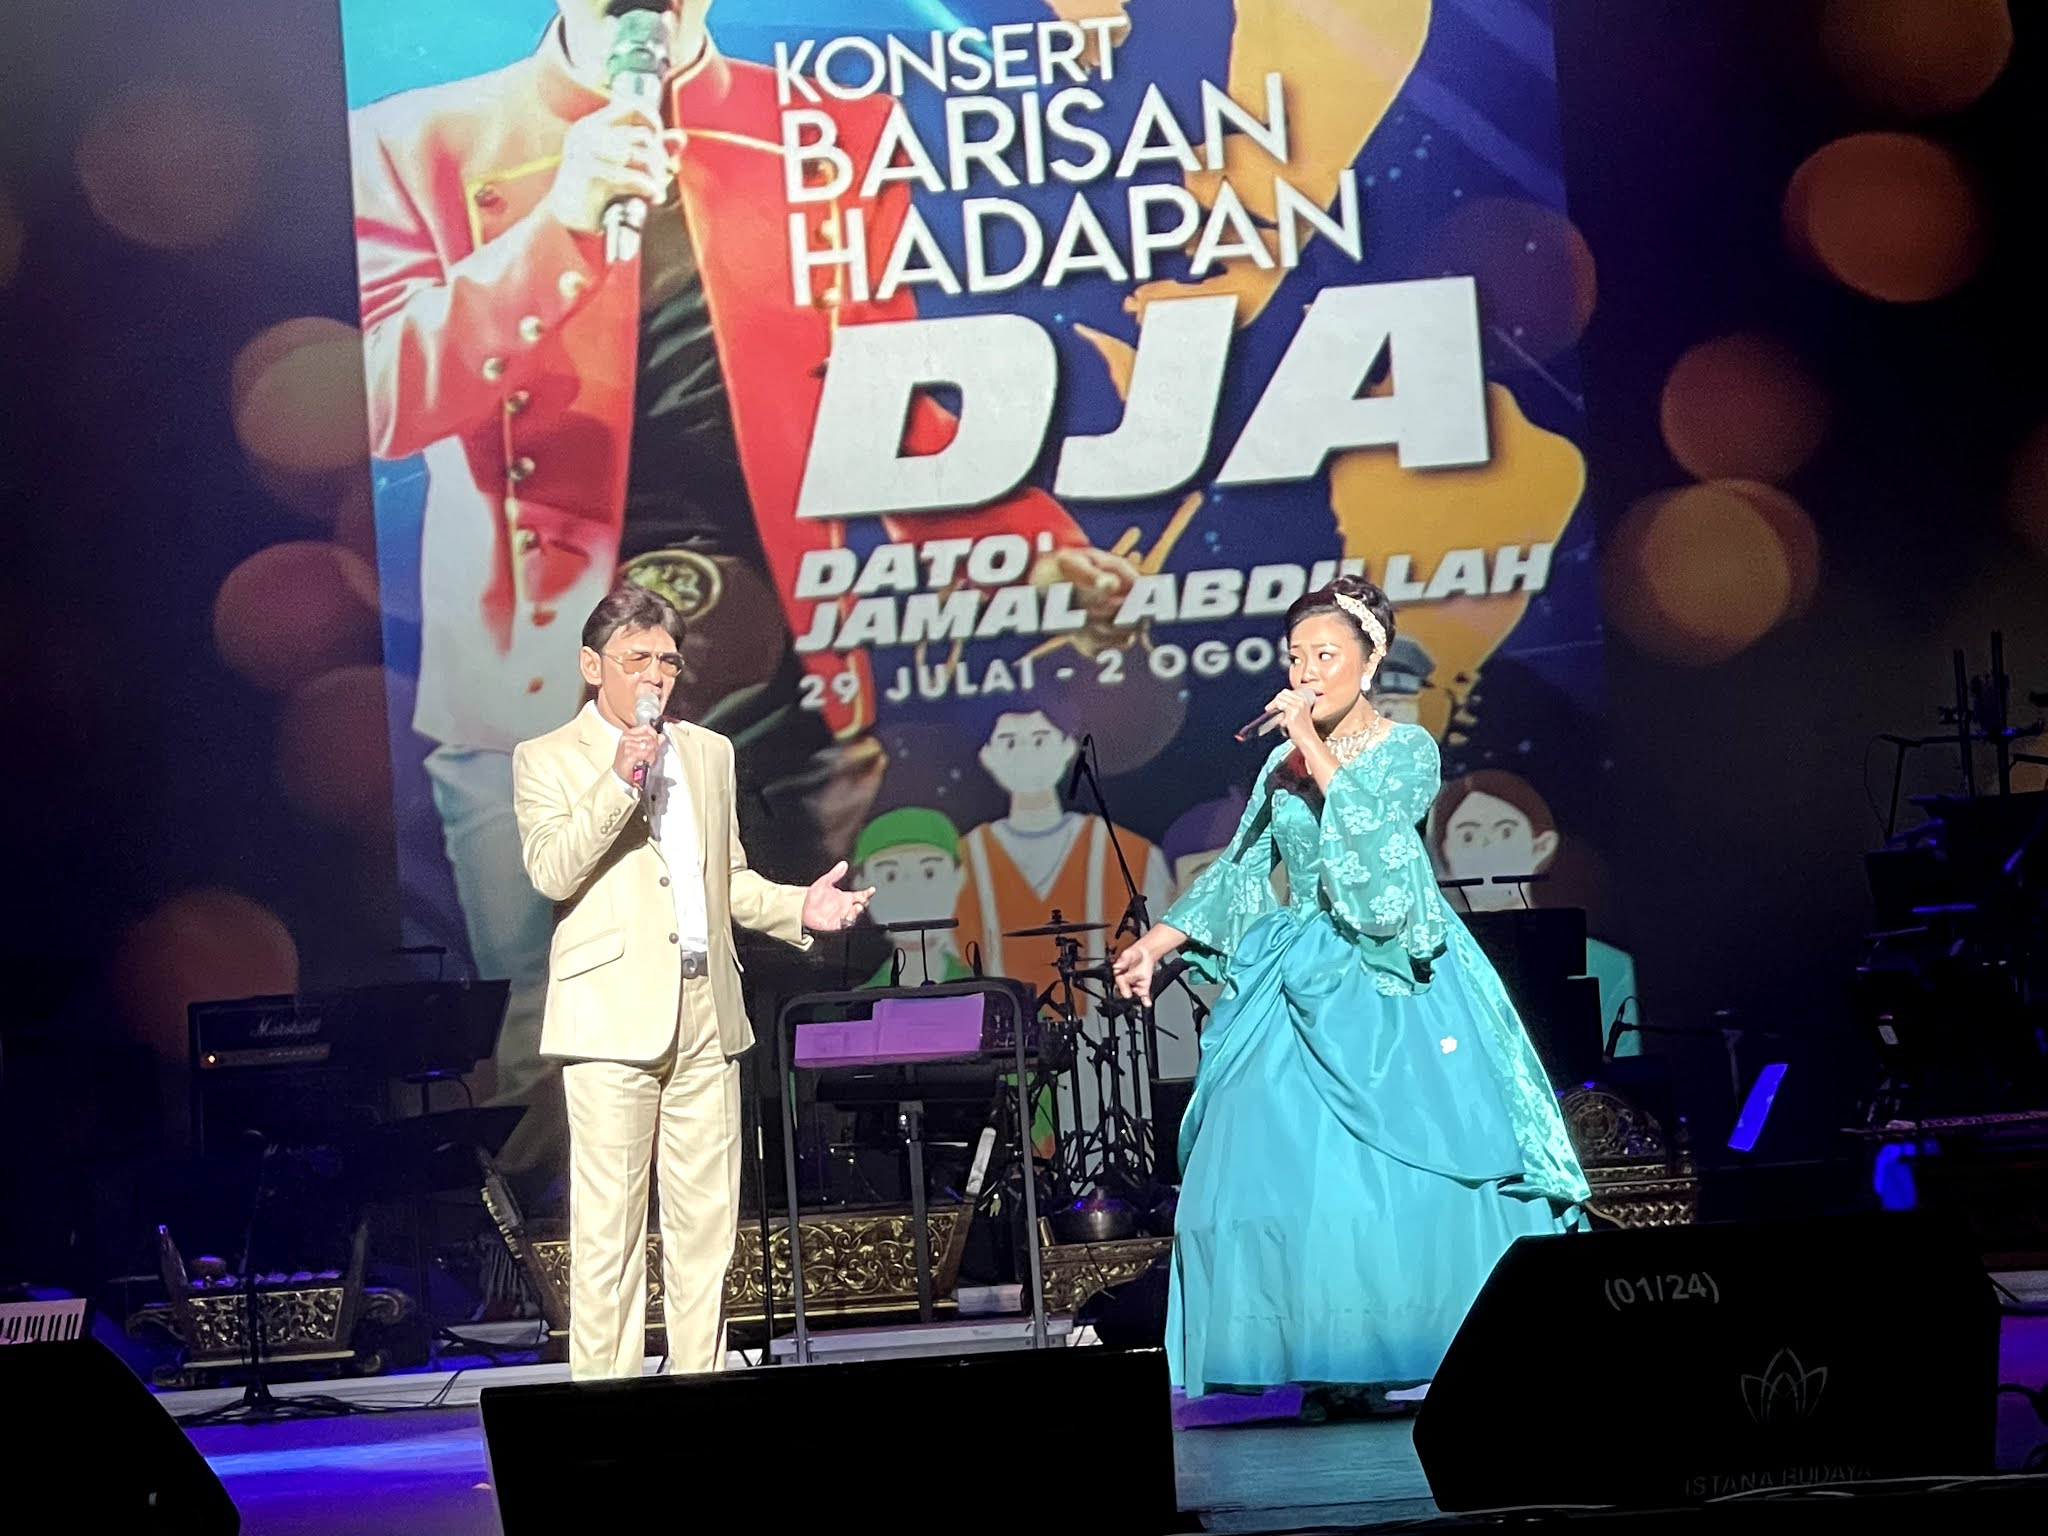 DATO' JAMAL ABDILLAH SERI PROGRAM ISTANA BUDAYA 2021 DENGAN NORMA BAHARU